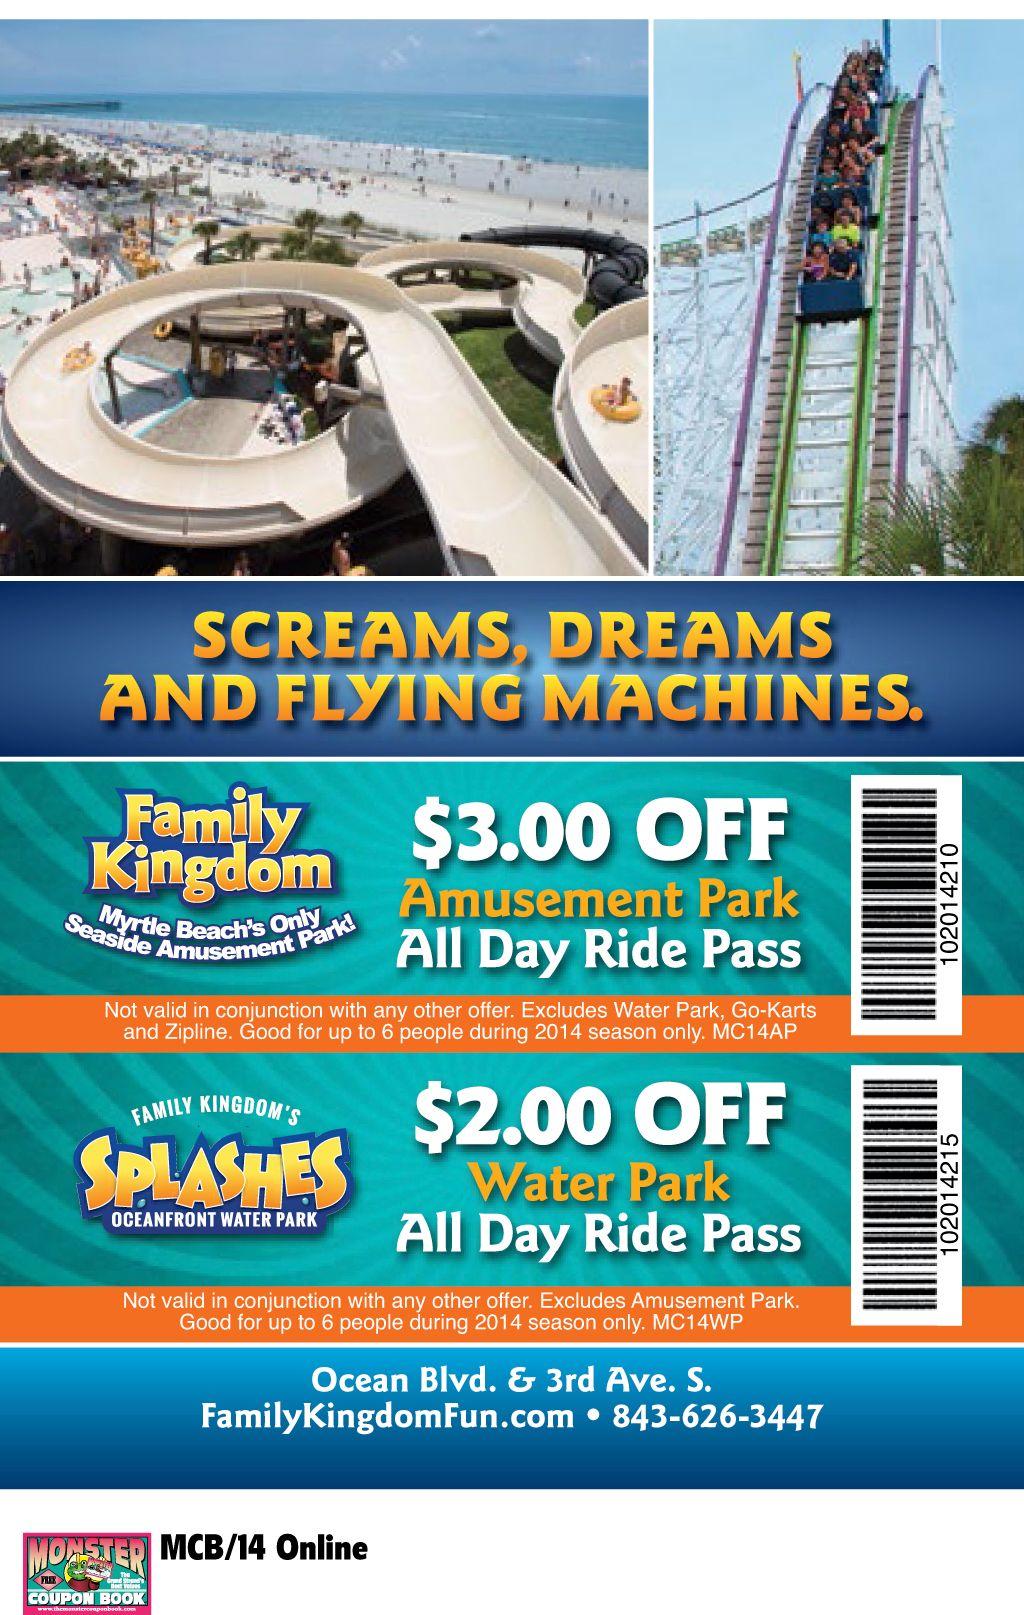 Family Kingdom S Splashes Water Park Myrtle Beach Resorts